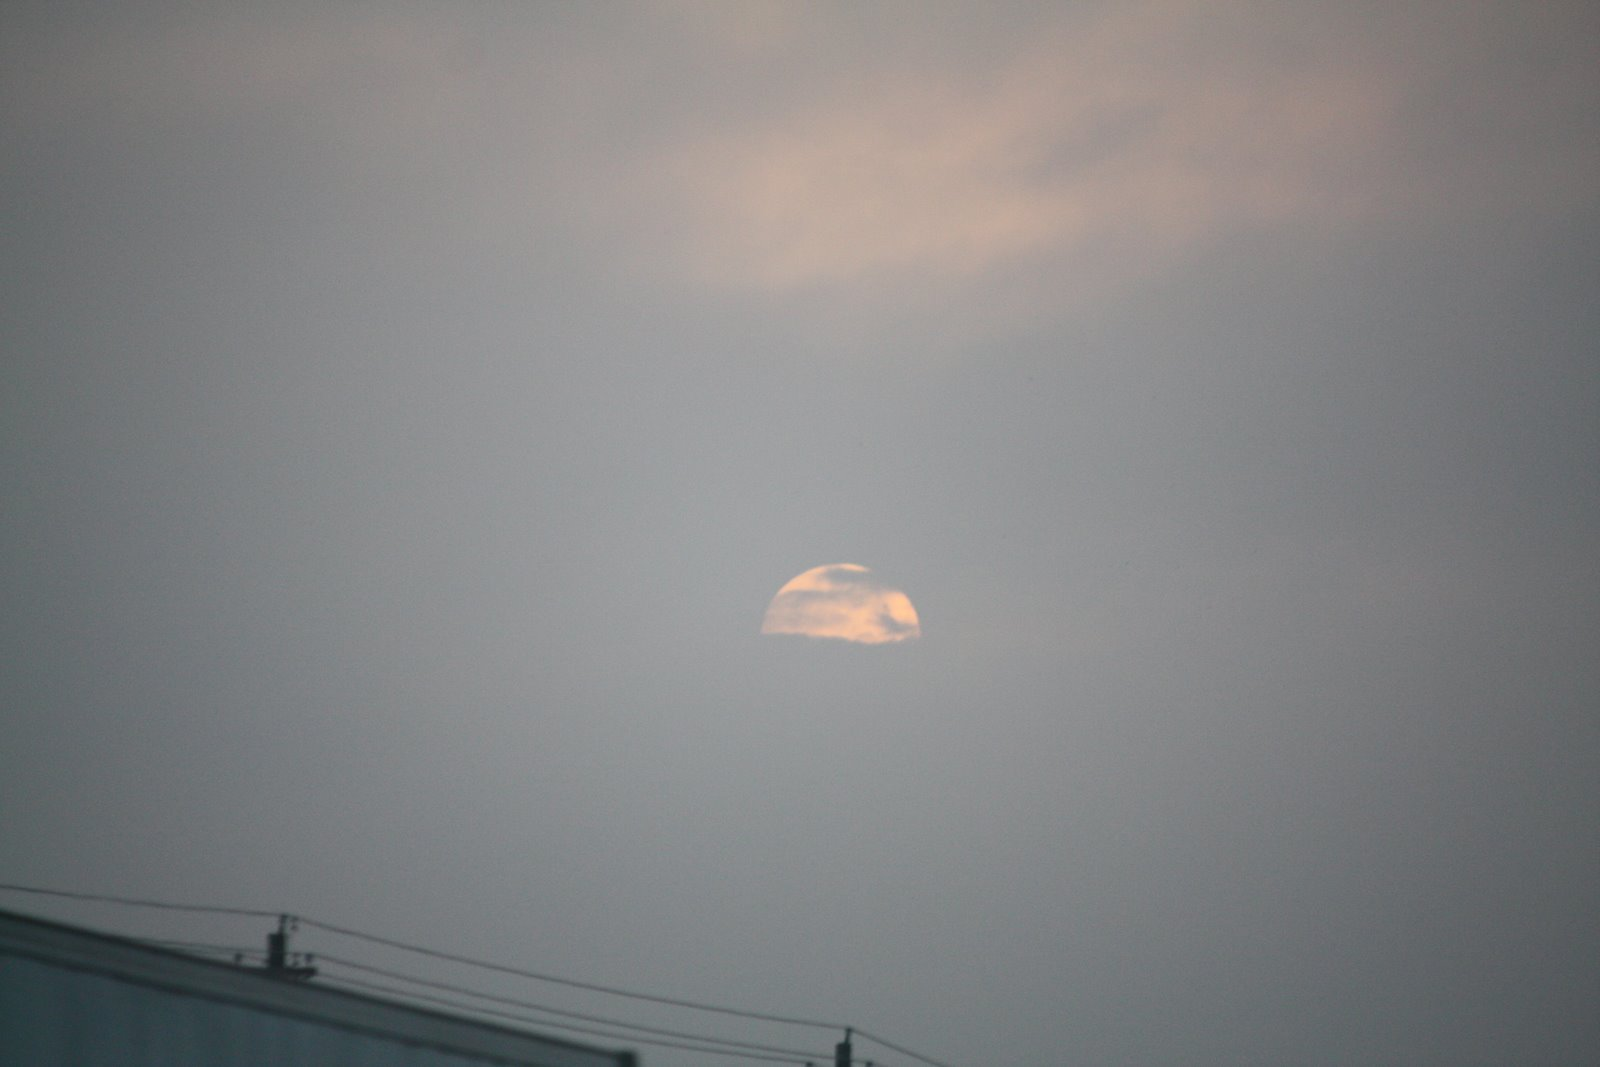 [SunEclipsedbyClouds.JPG]